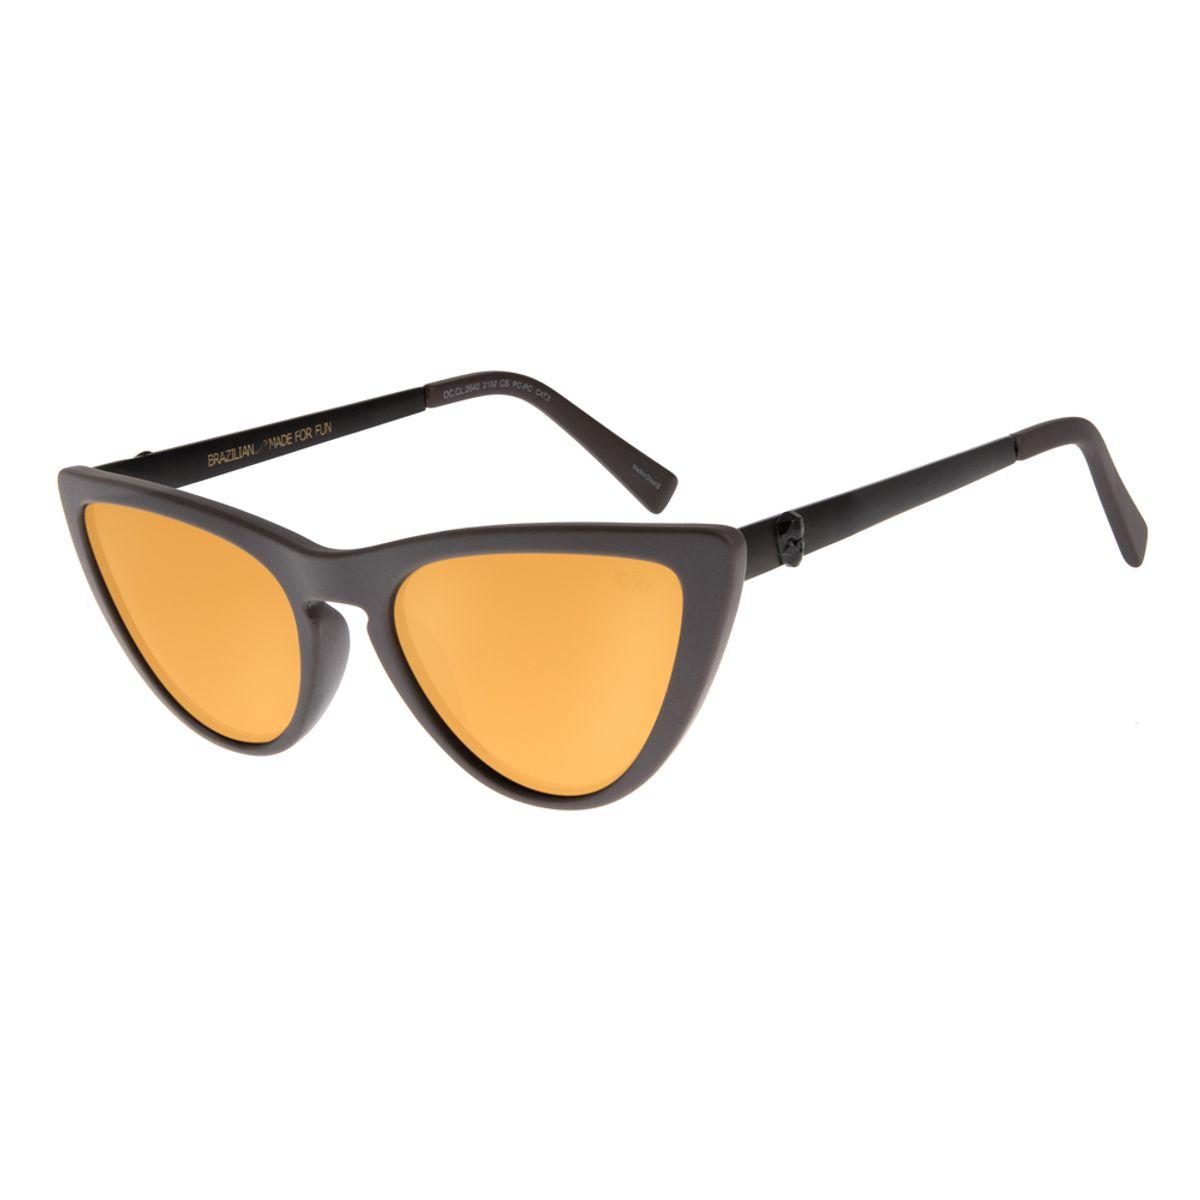 3fb1ee67c29c7 Óculos De Sol Chilli Beans Feminino Caveira Gatinho Marrom 2640 ...